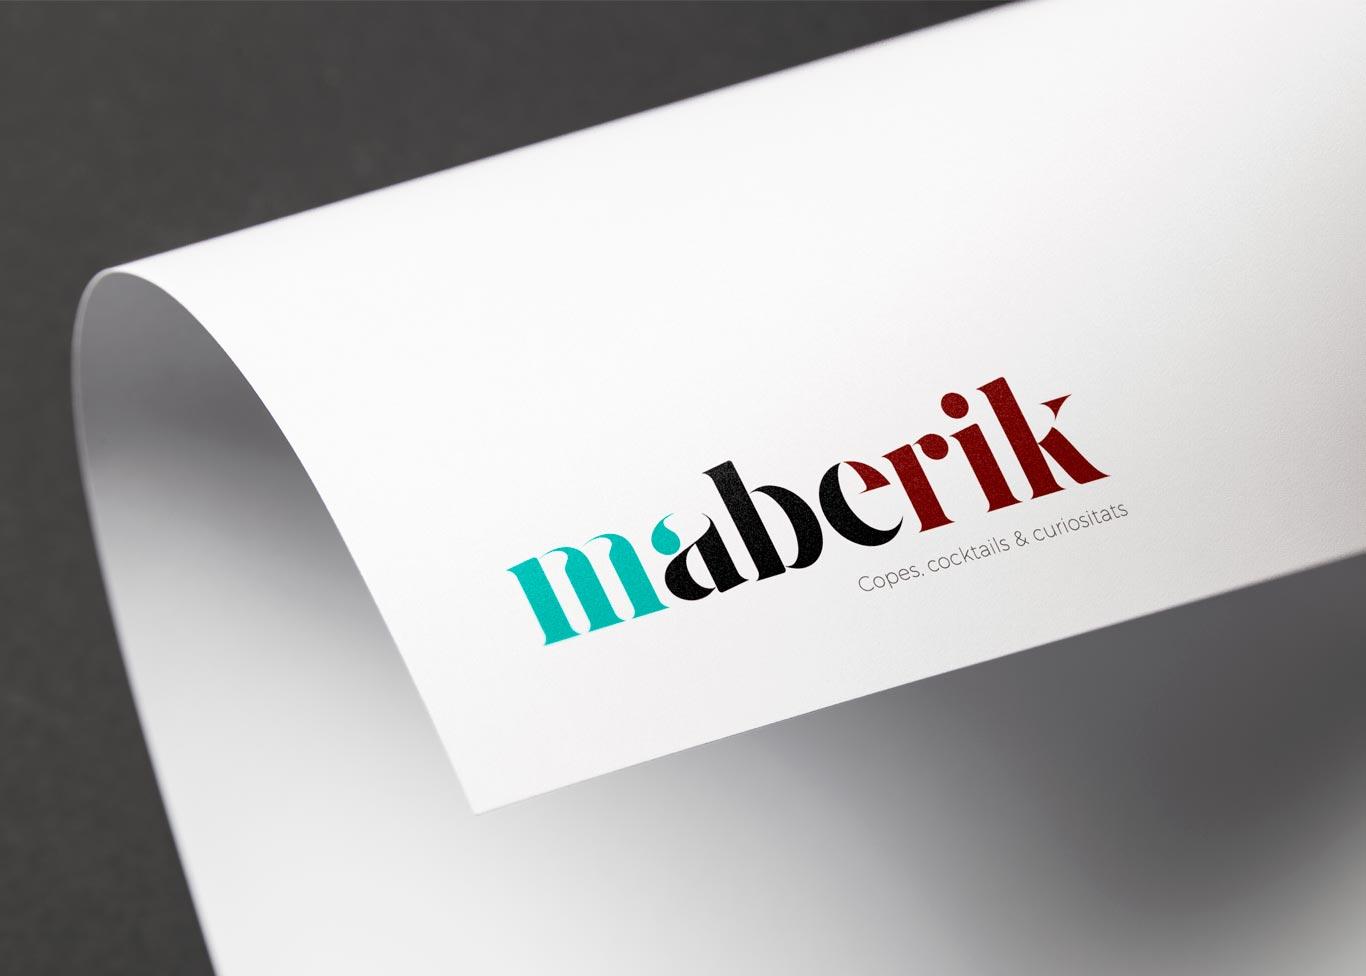 logotipo 22maberick